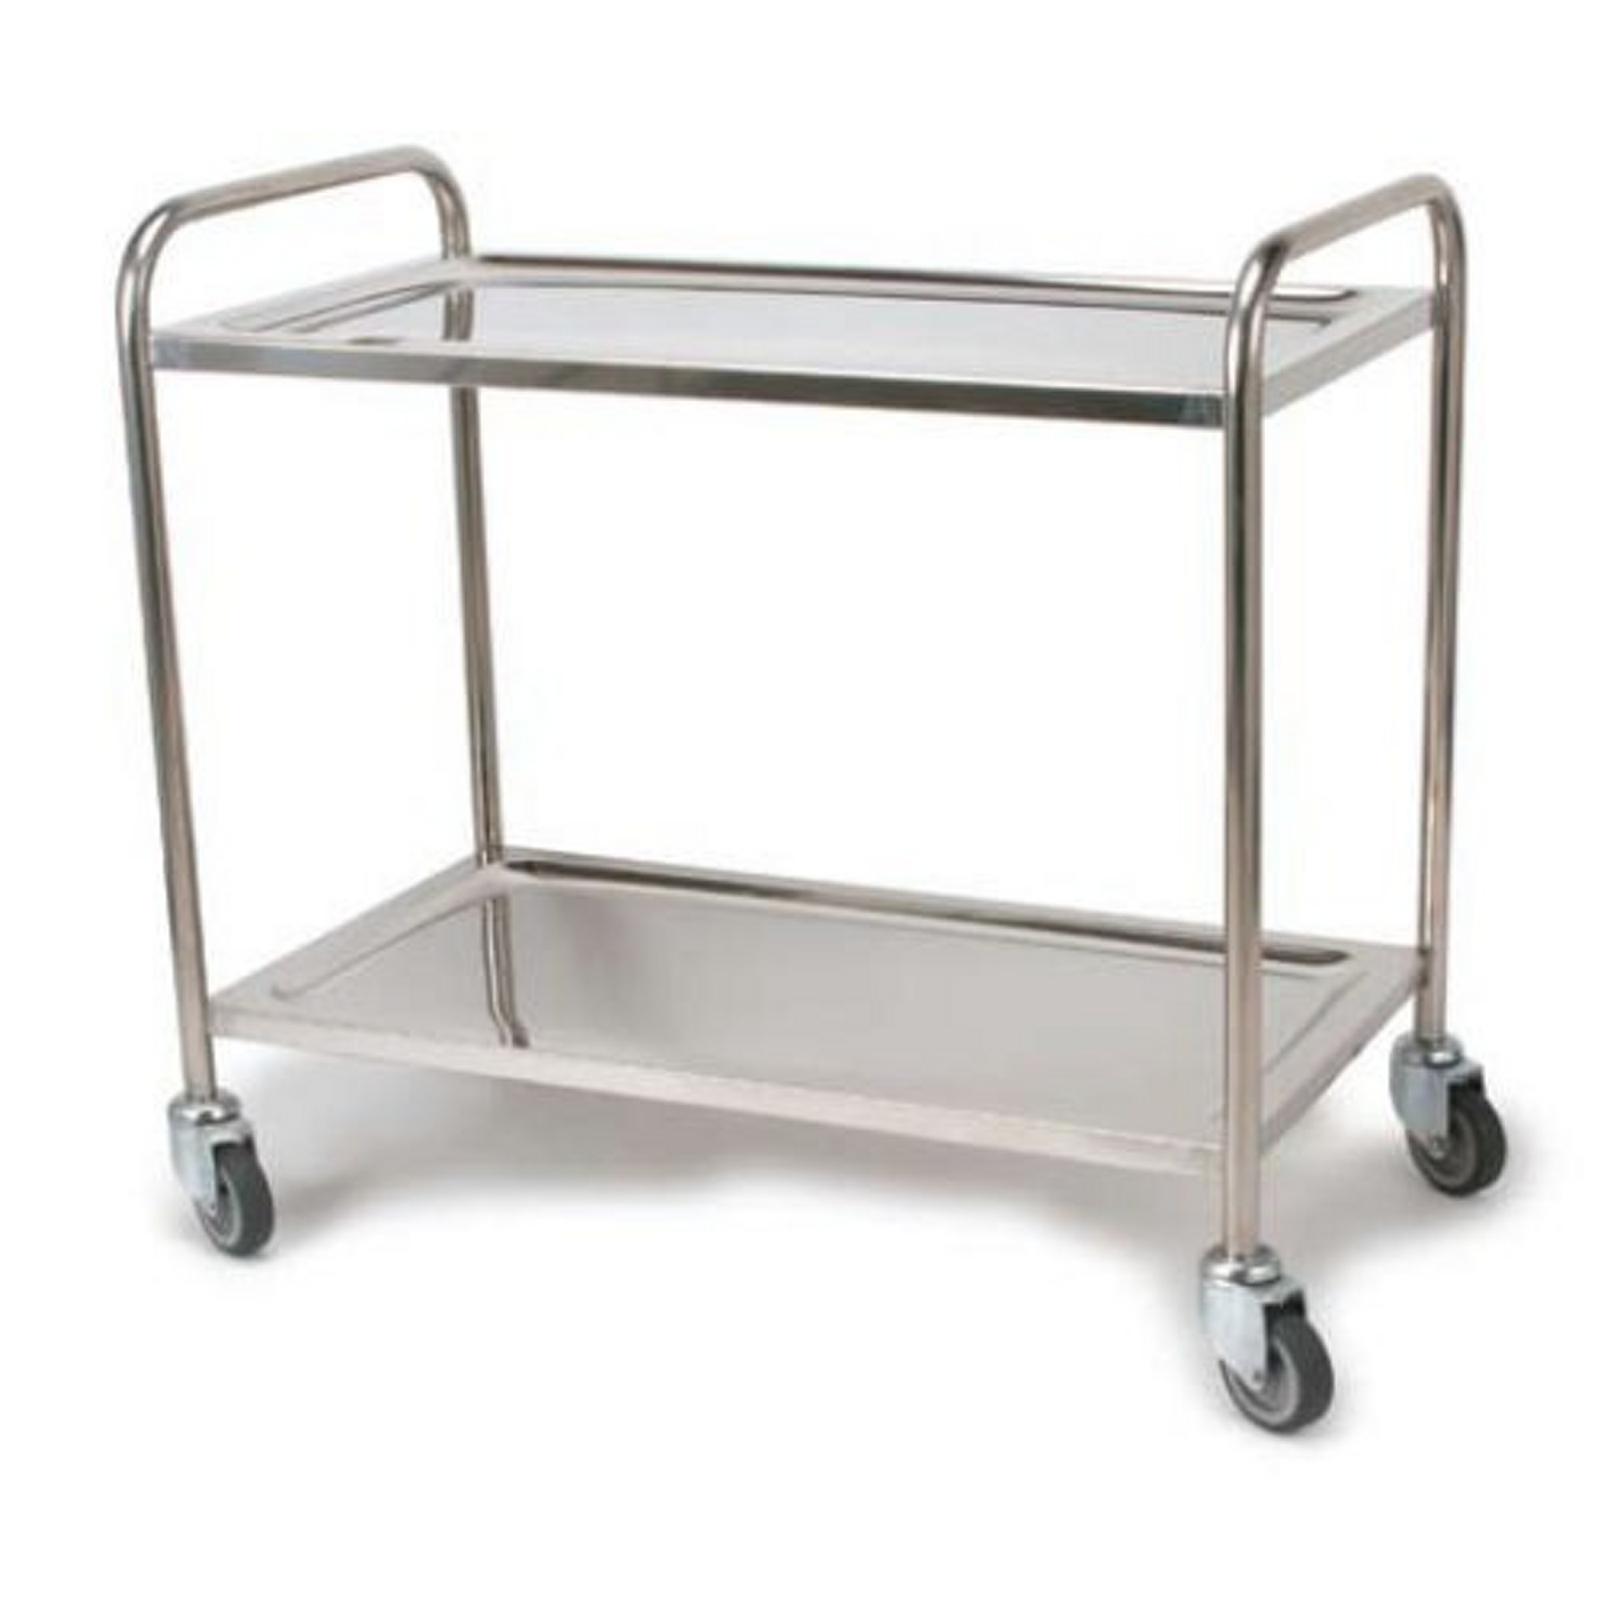 Stainless Steel Trolleys - 2 tier